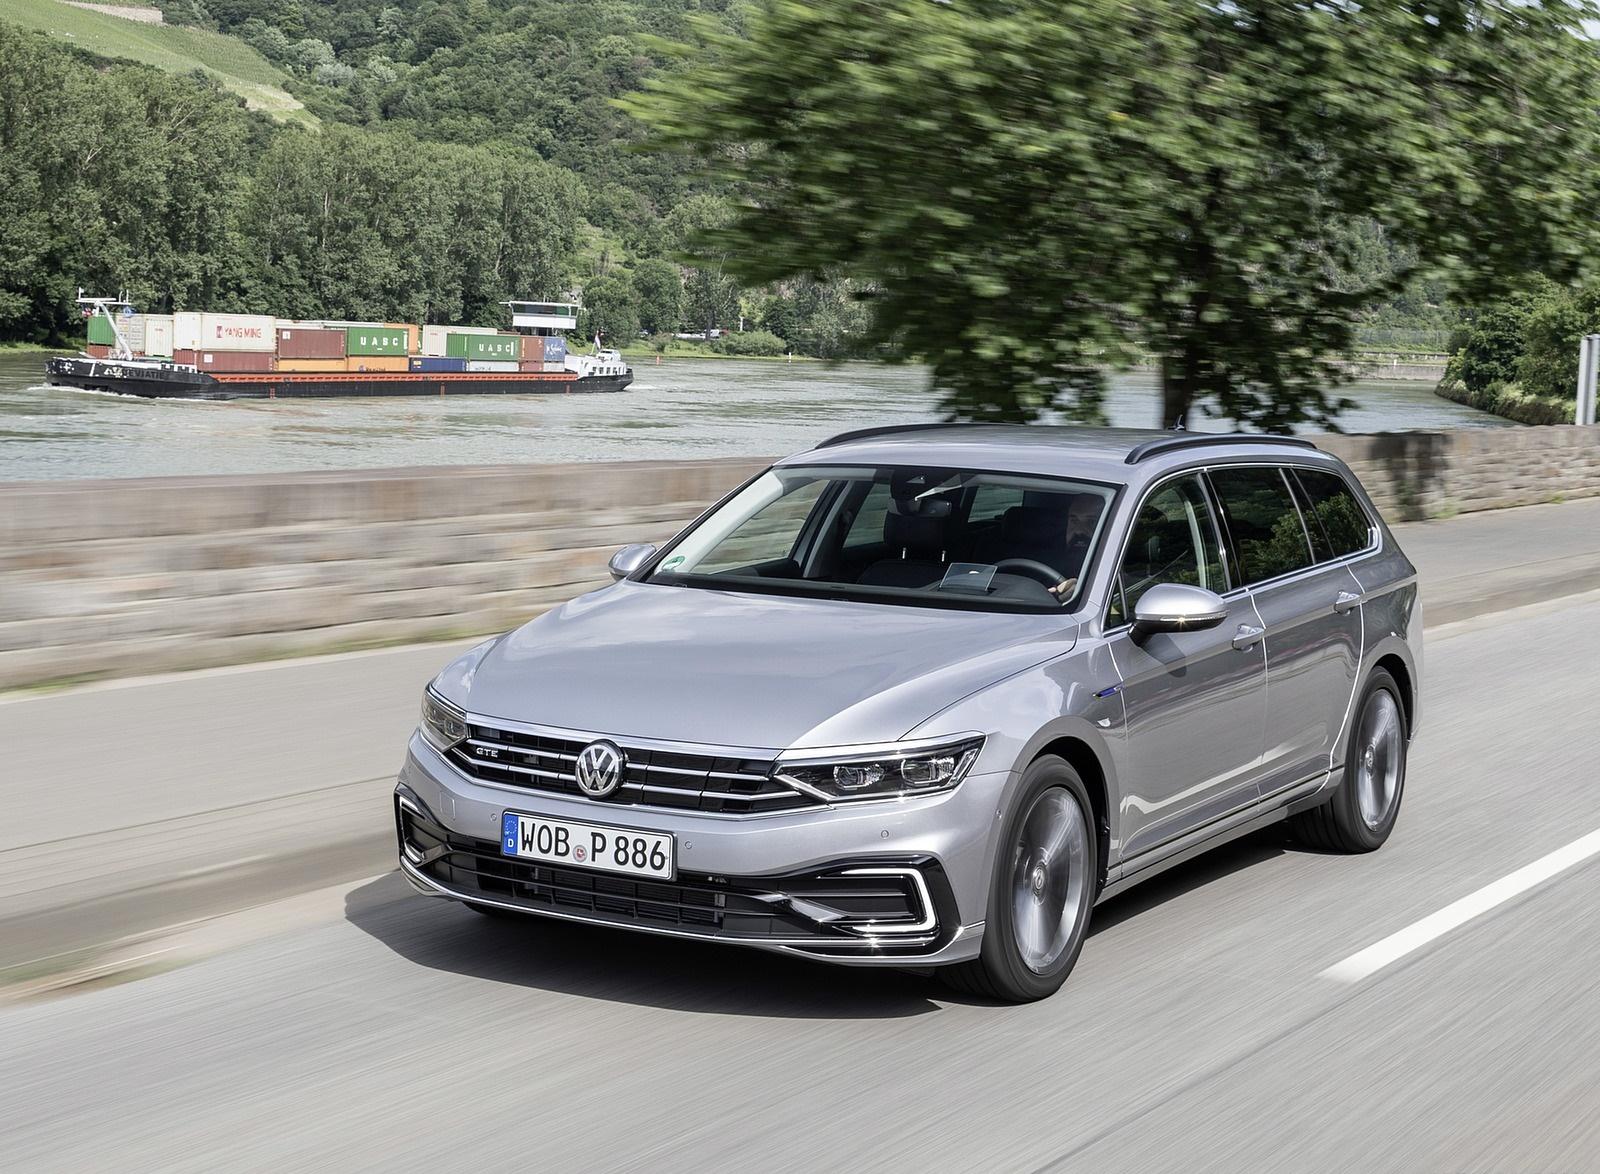 2020 Volkswagen Passat GTE Variant (Plug-In Hybrid EU-Spec) Front Three-Quarter Wallpapers (1)